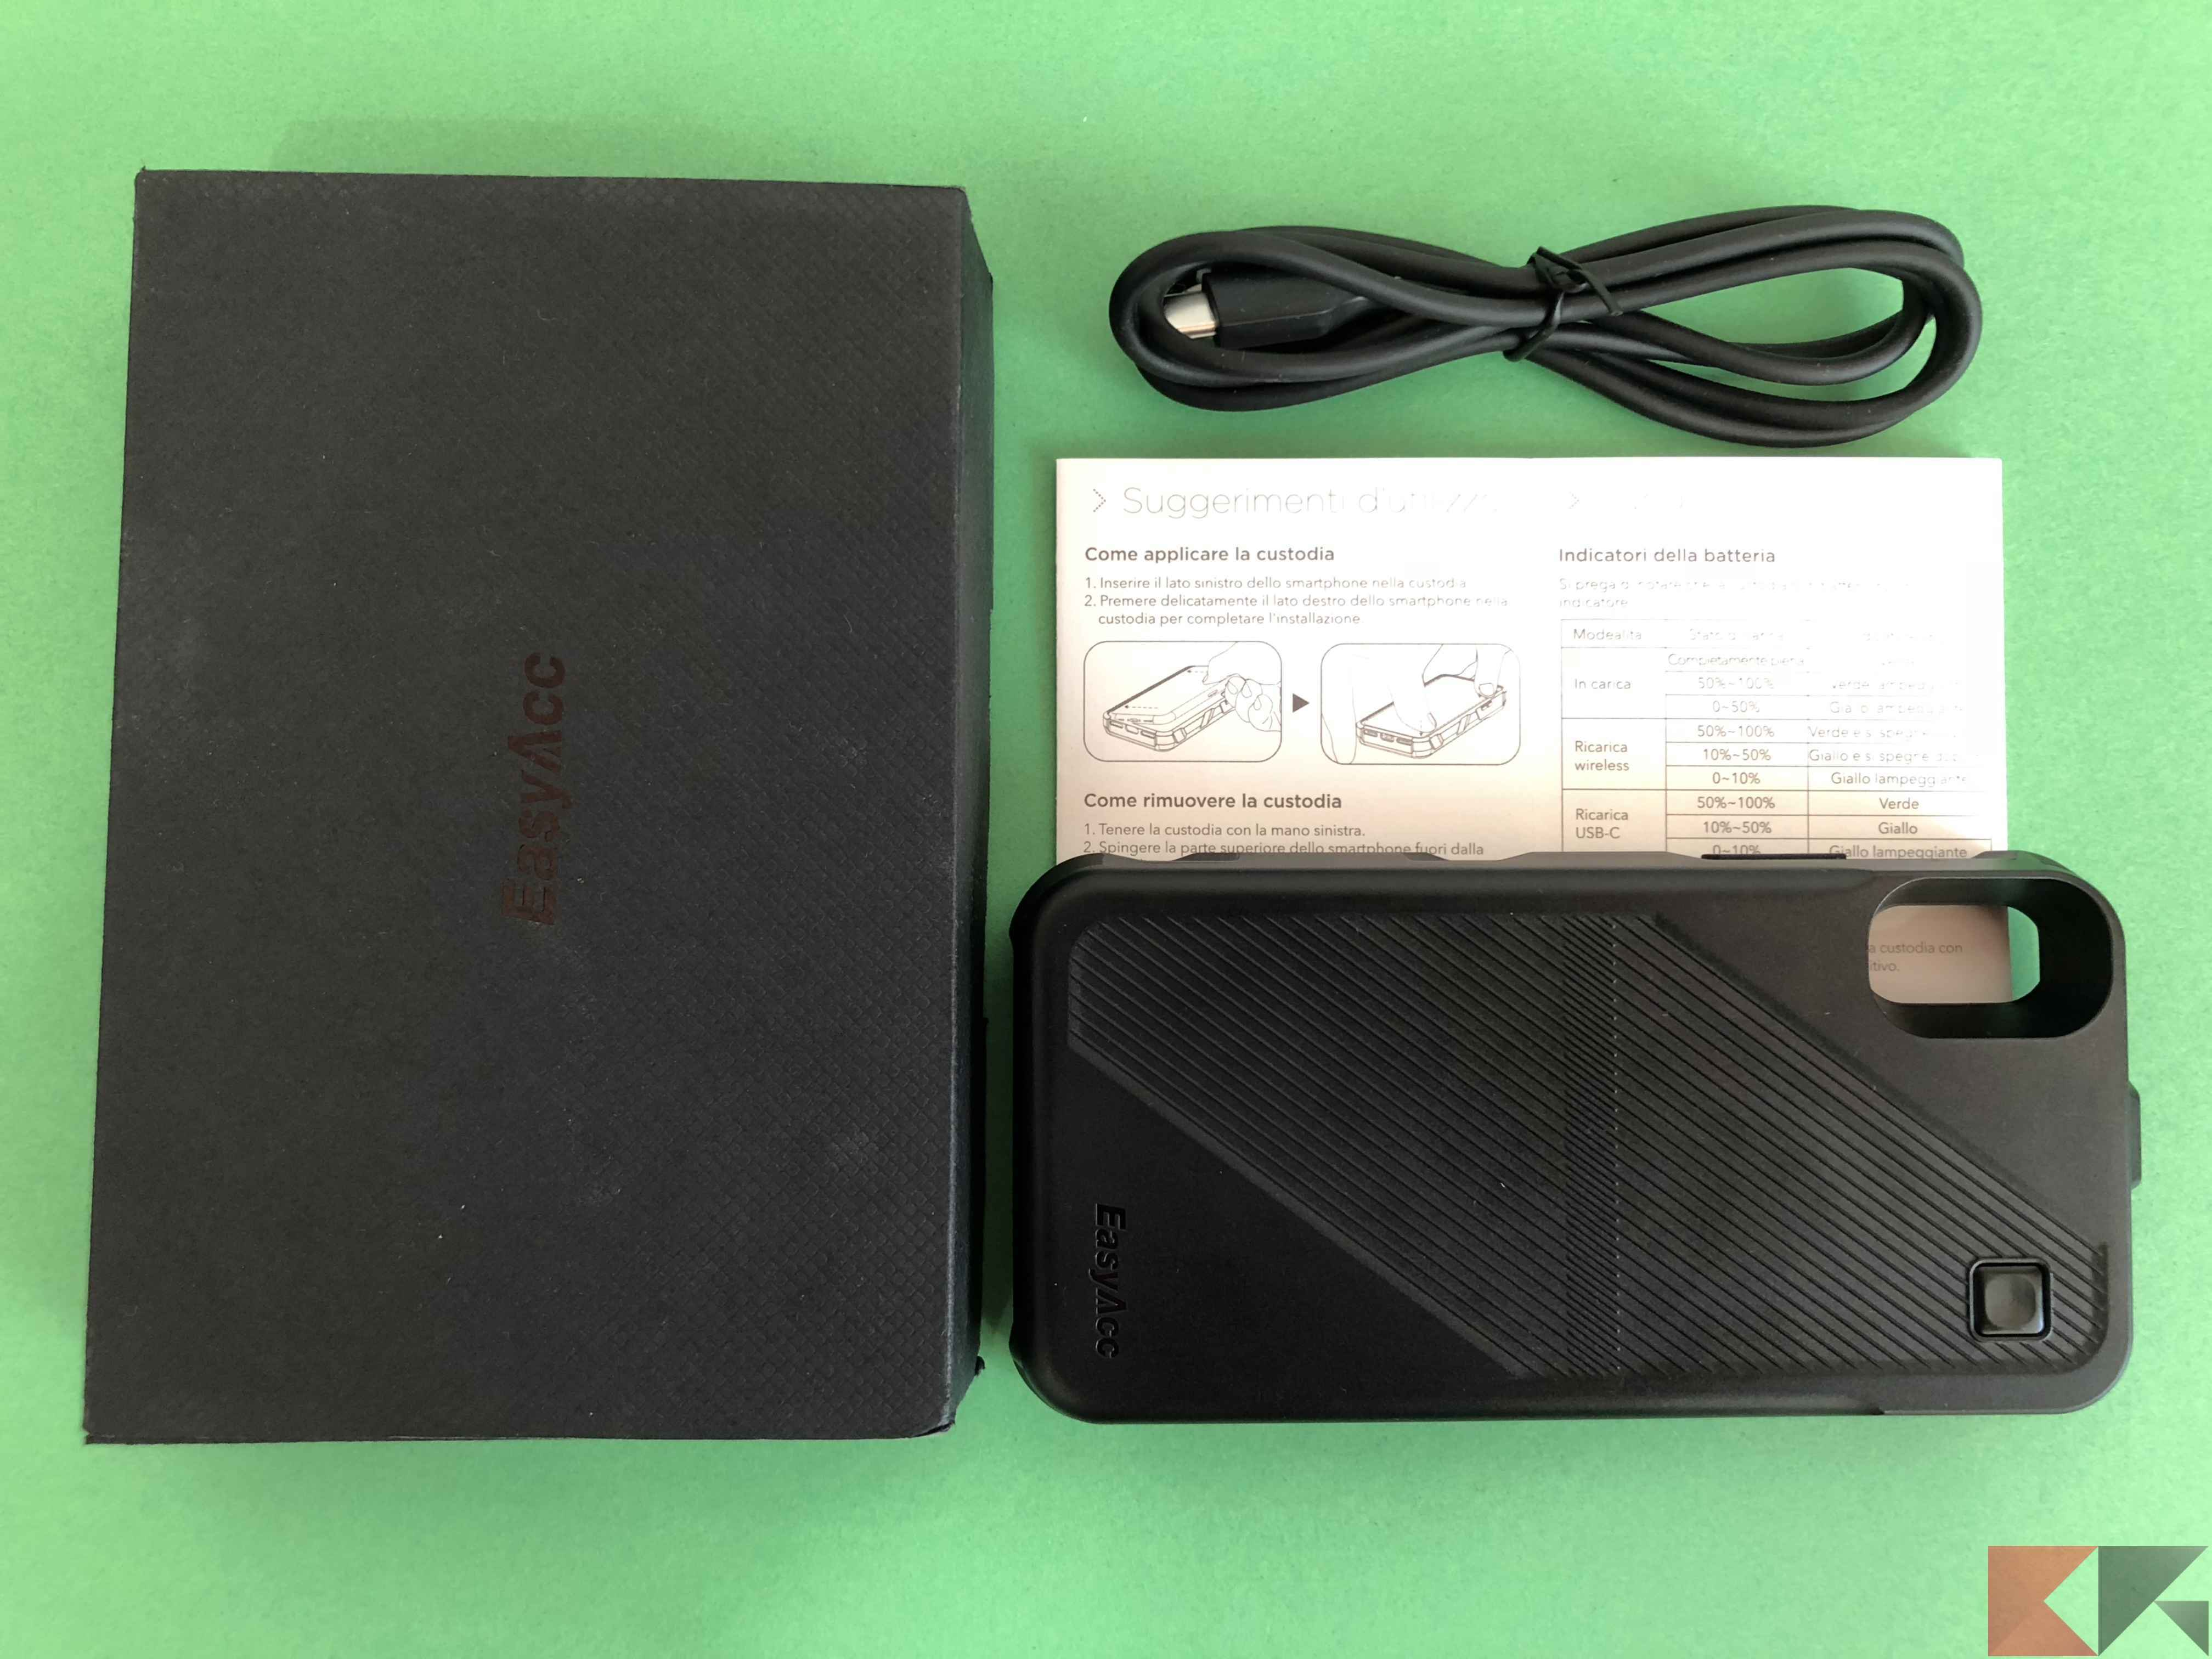 EasyAcc 5000 mAh custodia batteria iPhone X